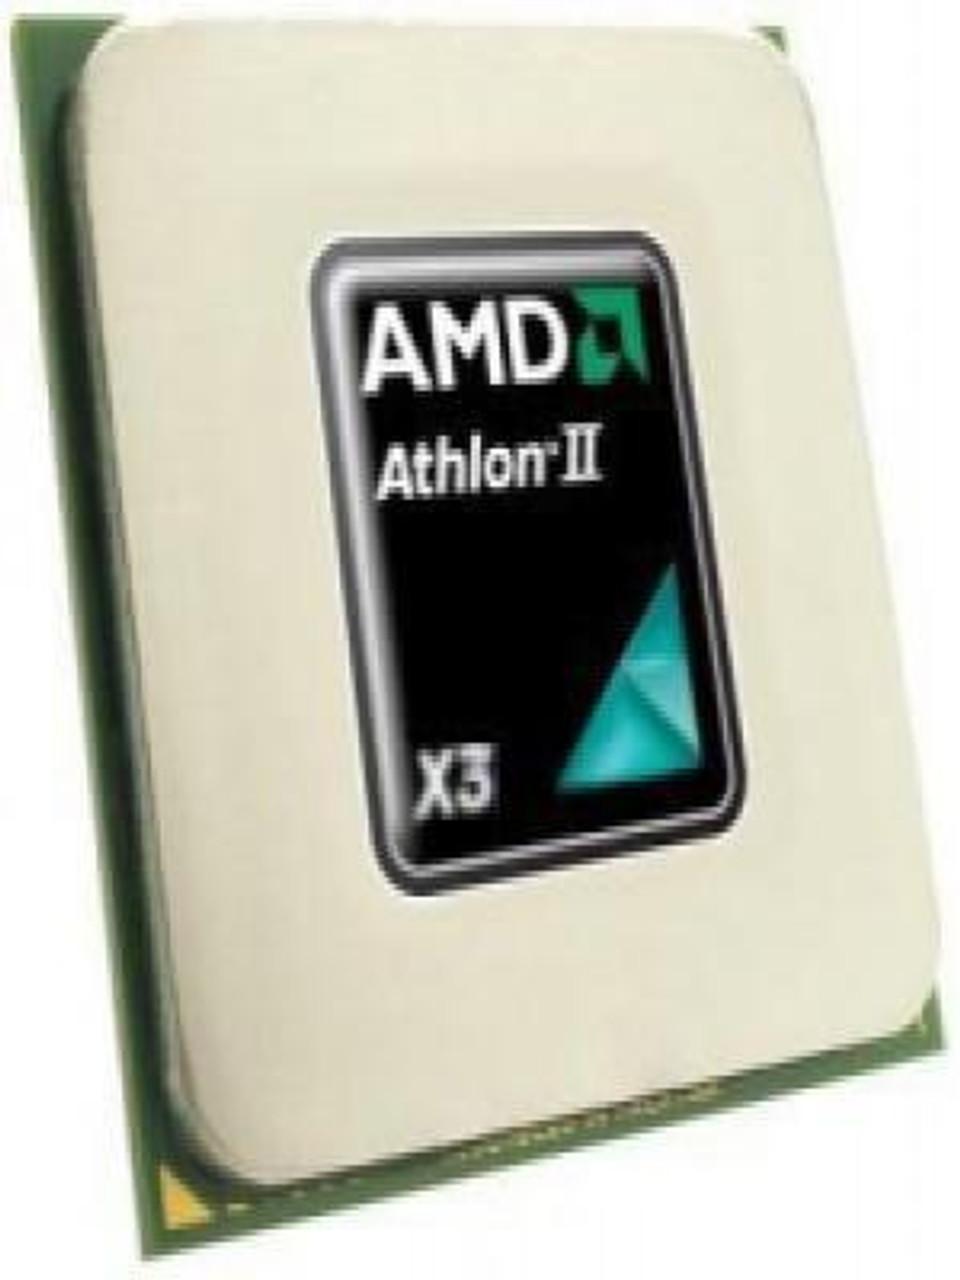 AMD Athlon II X3 455 3.3GHz Triple-Core CPU Processor ADX455WFK32GM Socket AM3 938pin